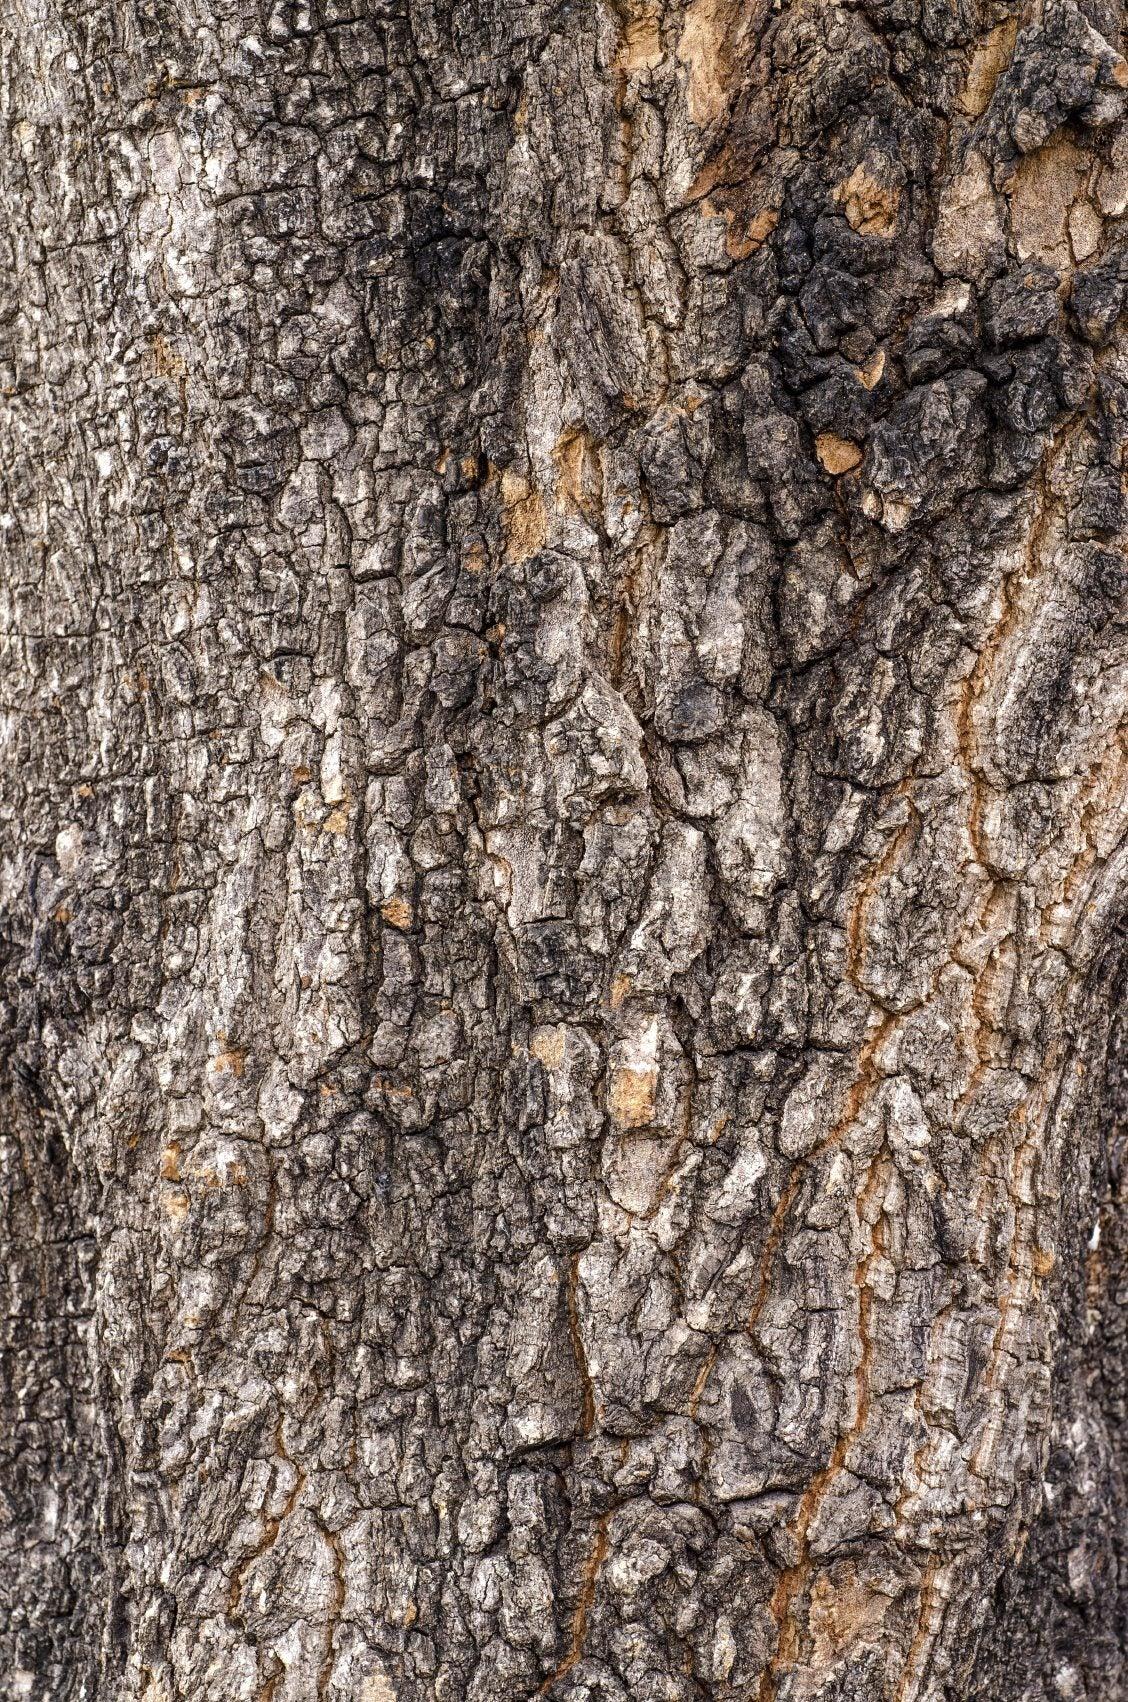 Seeping Pecan Trees Pecan Tree Has Sap Dripping From It